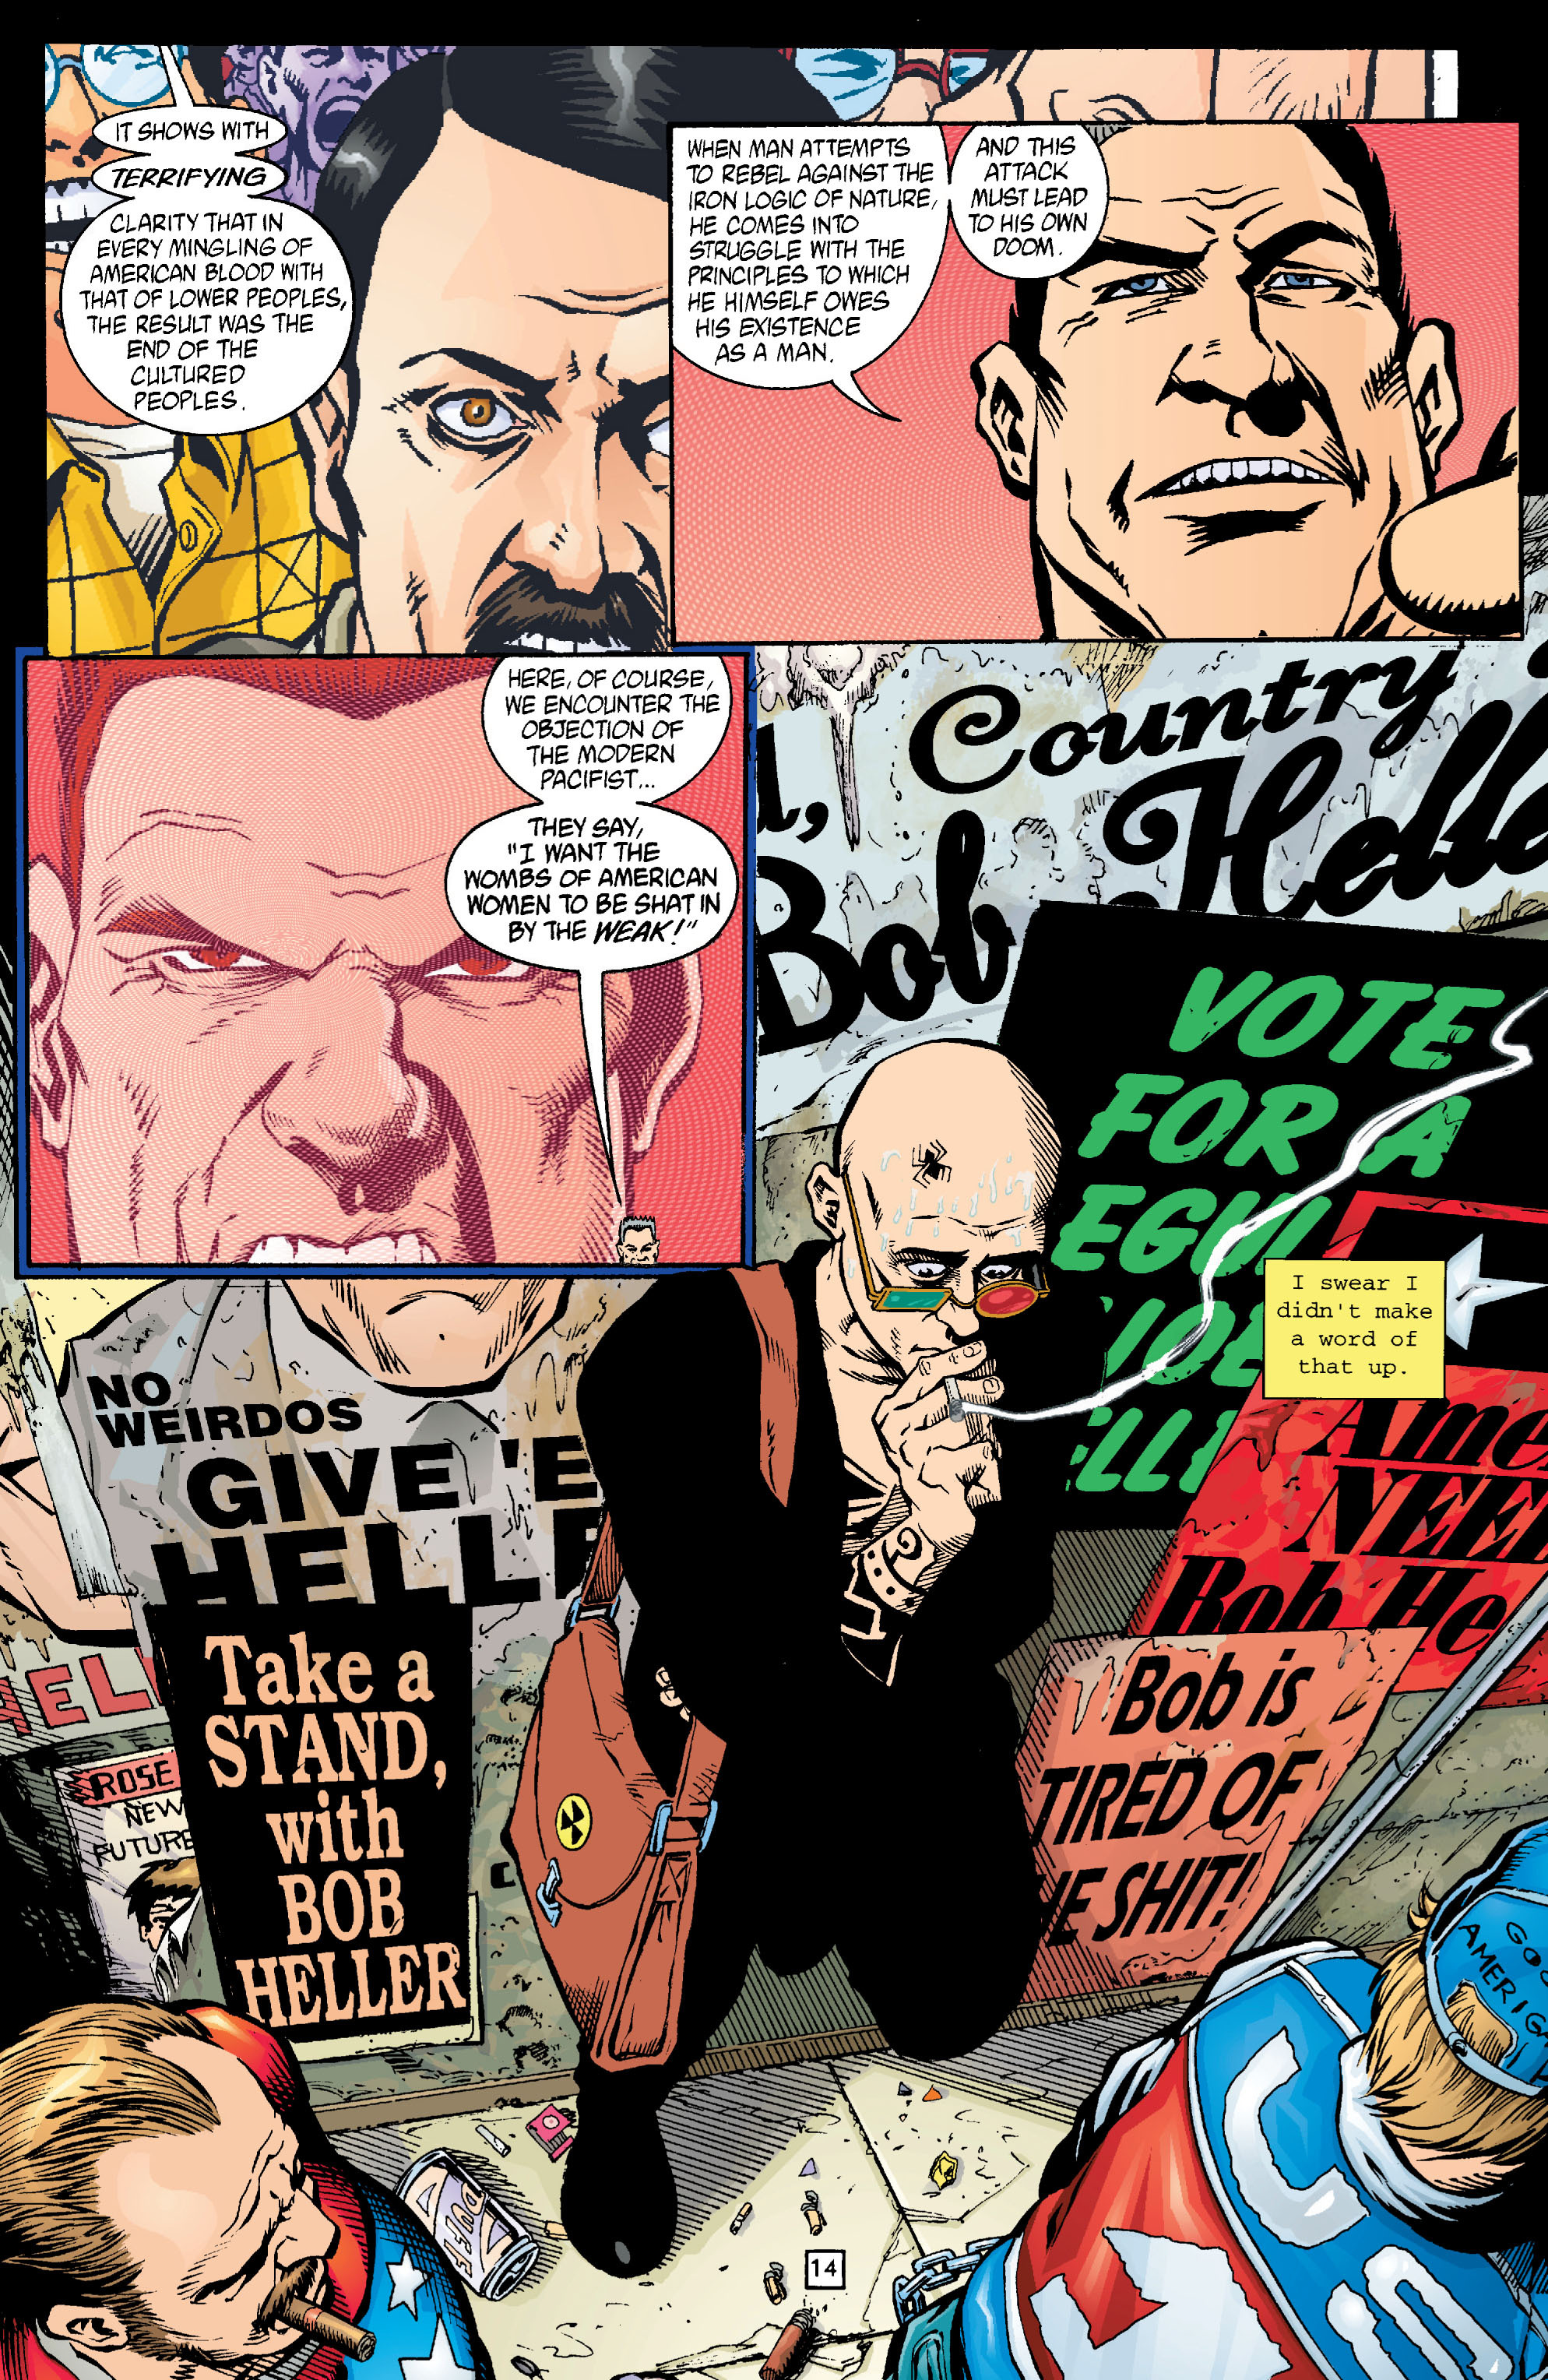 Read online Transmetropolitan comic -  Issue #15 - 15